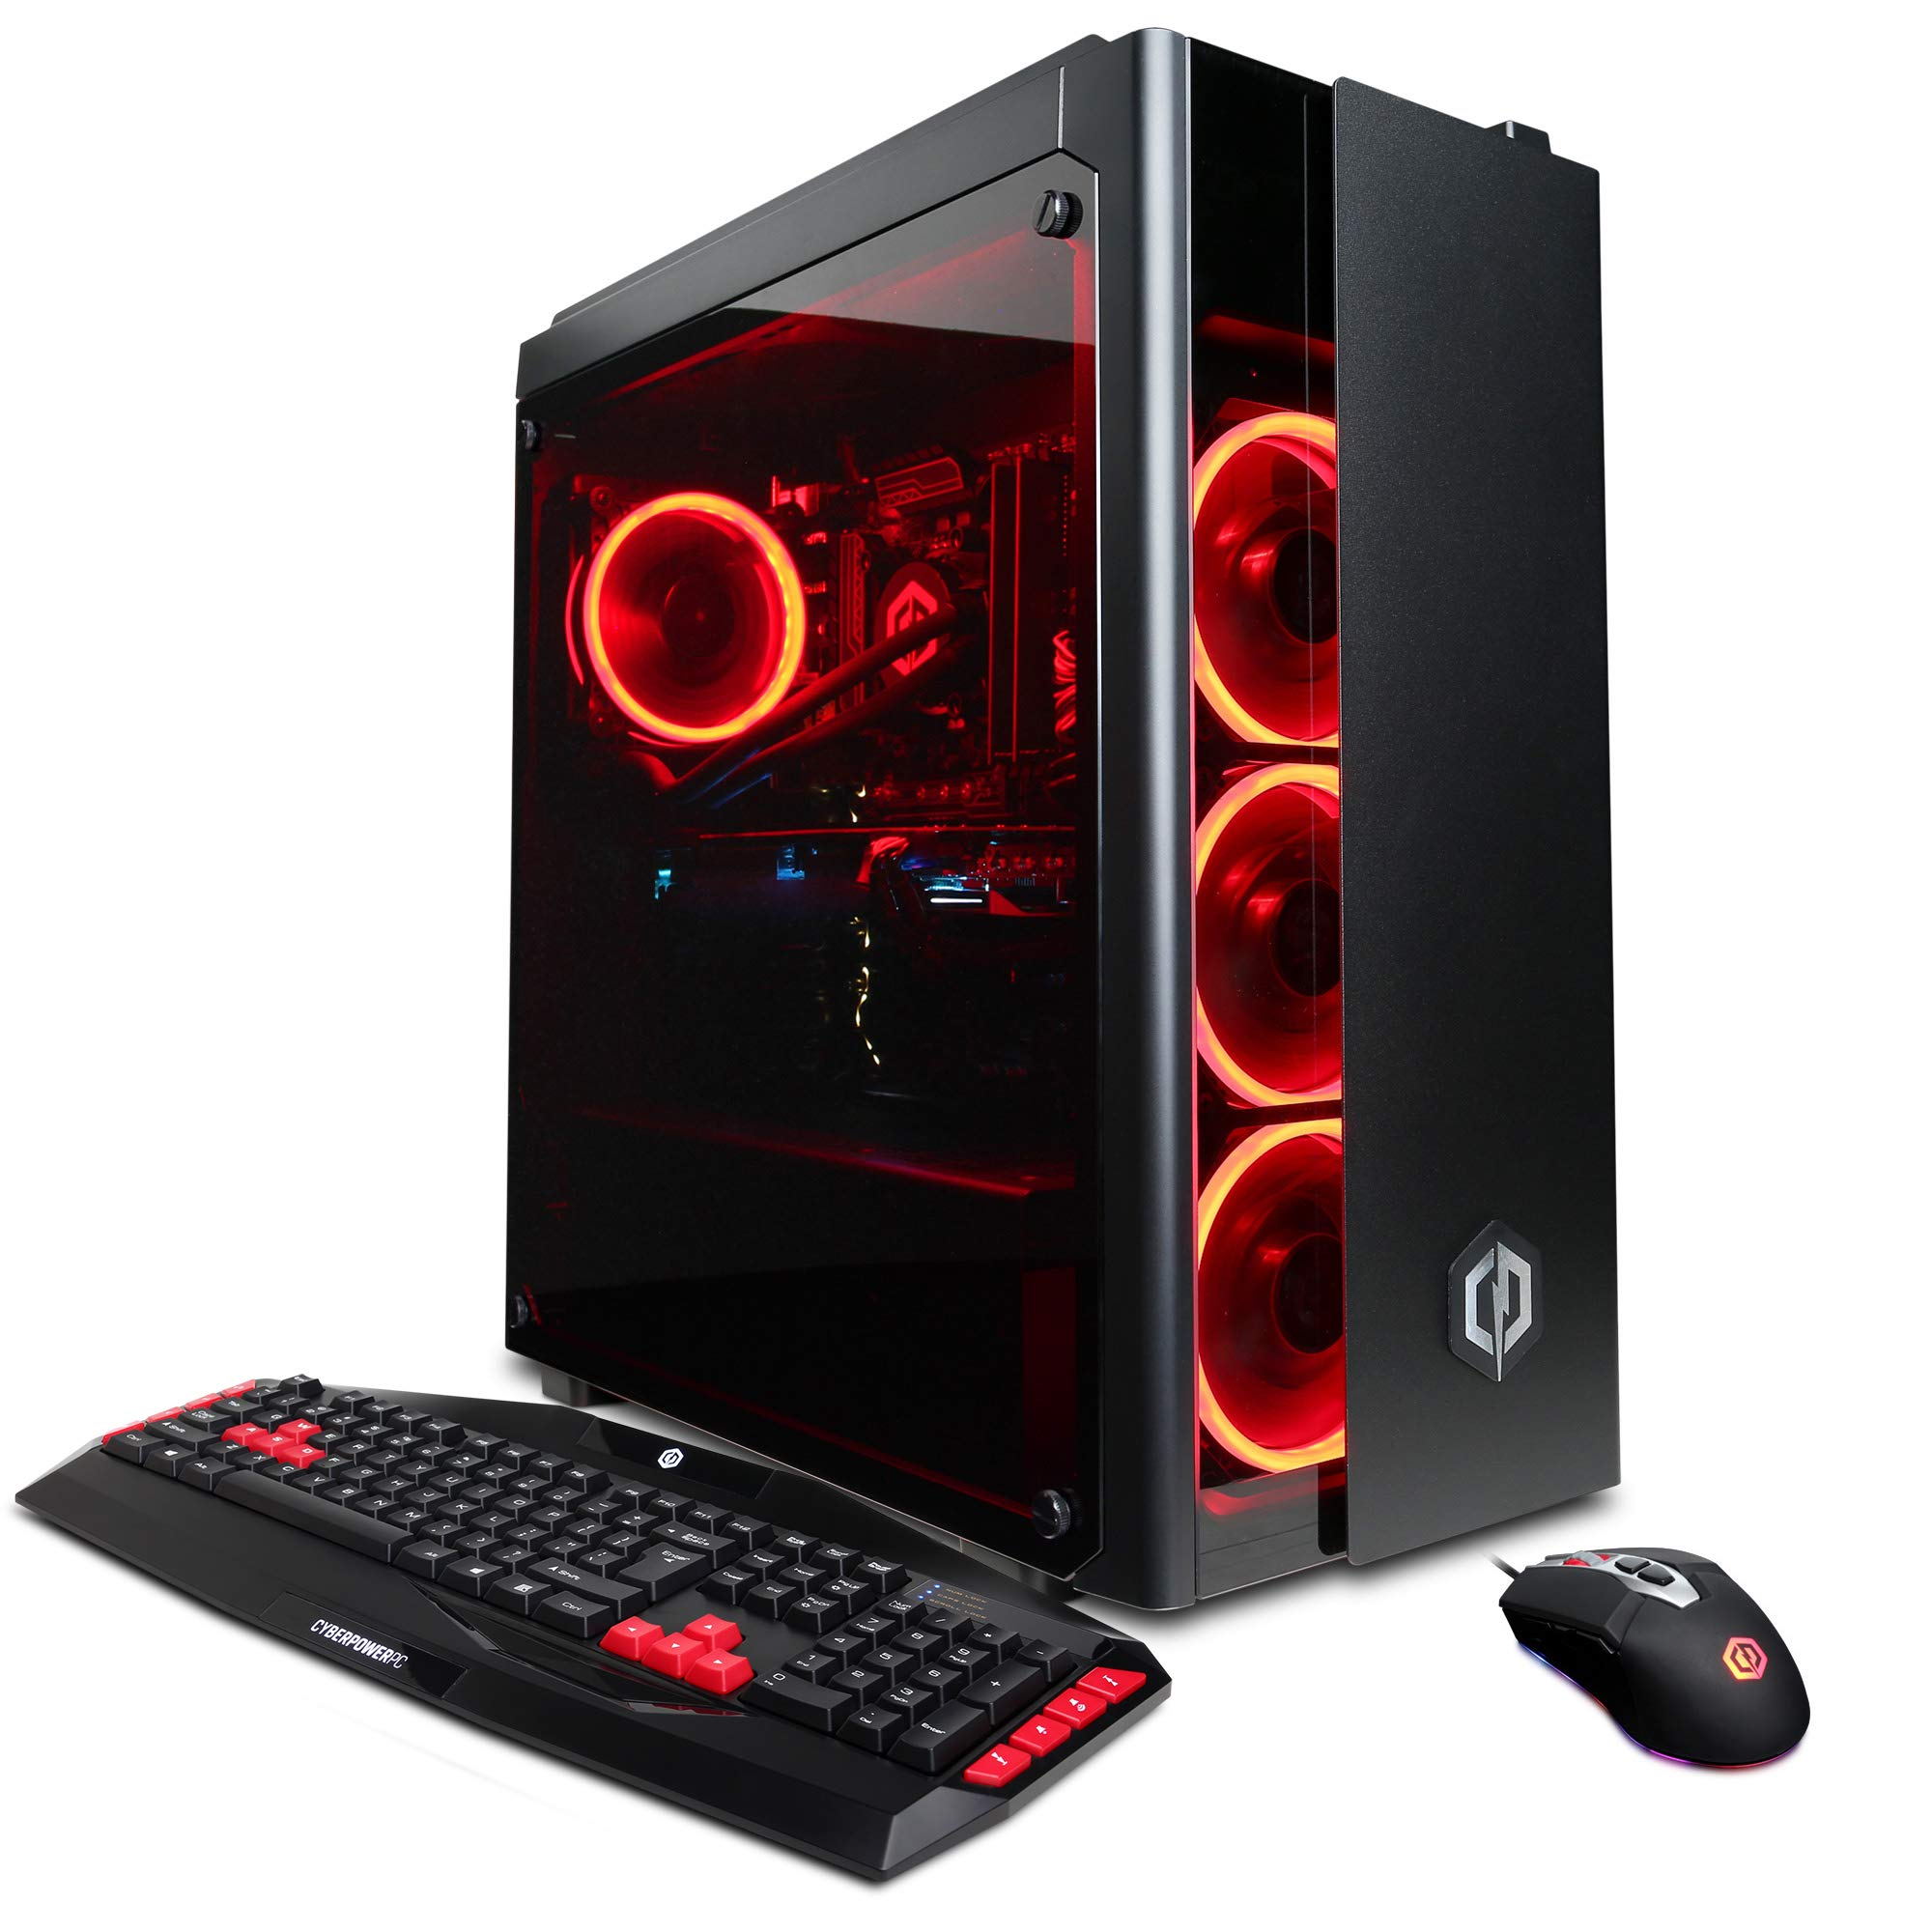 CYBERPOWERPC Gamer Xtreme VR GXiVR8080A4 Gaming PC (Liquid Cooled Intel i7-9700K 3.6GHz, 16GB DDR4, NVIDIA GeForce RTX 2080 8GB, 240GB SSD, 1TB HDD, WiFi & Win 10 Home) Black